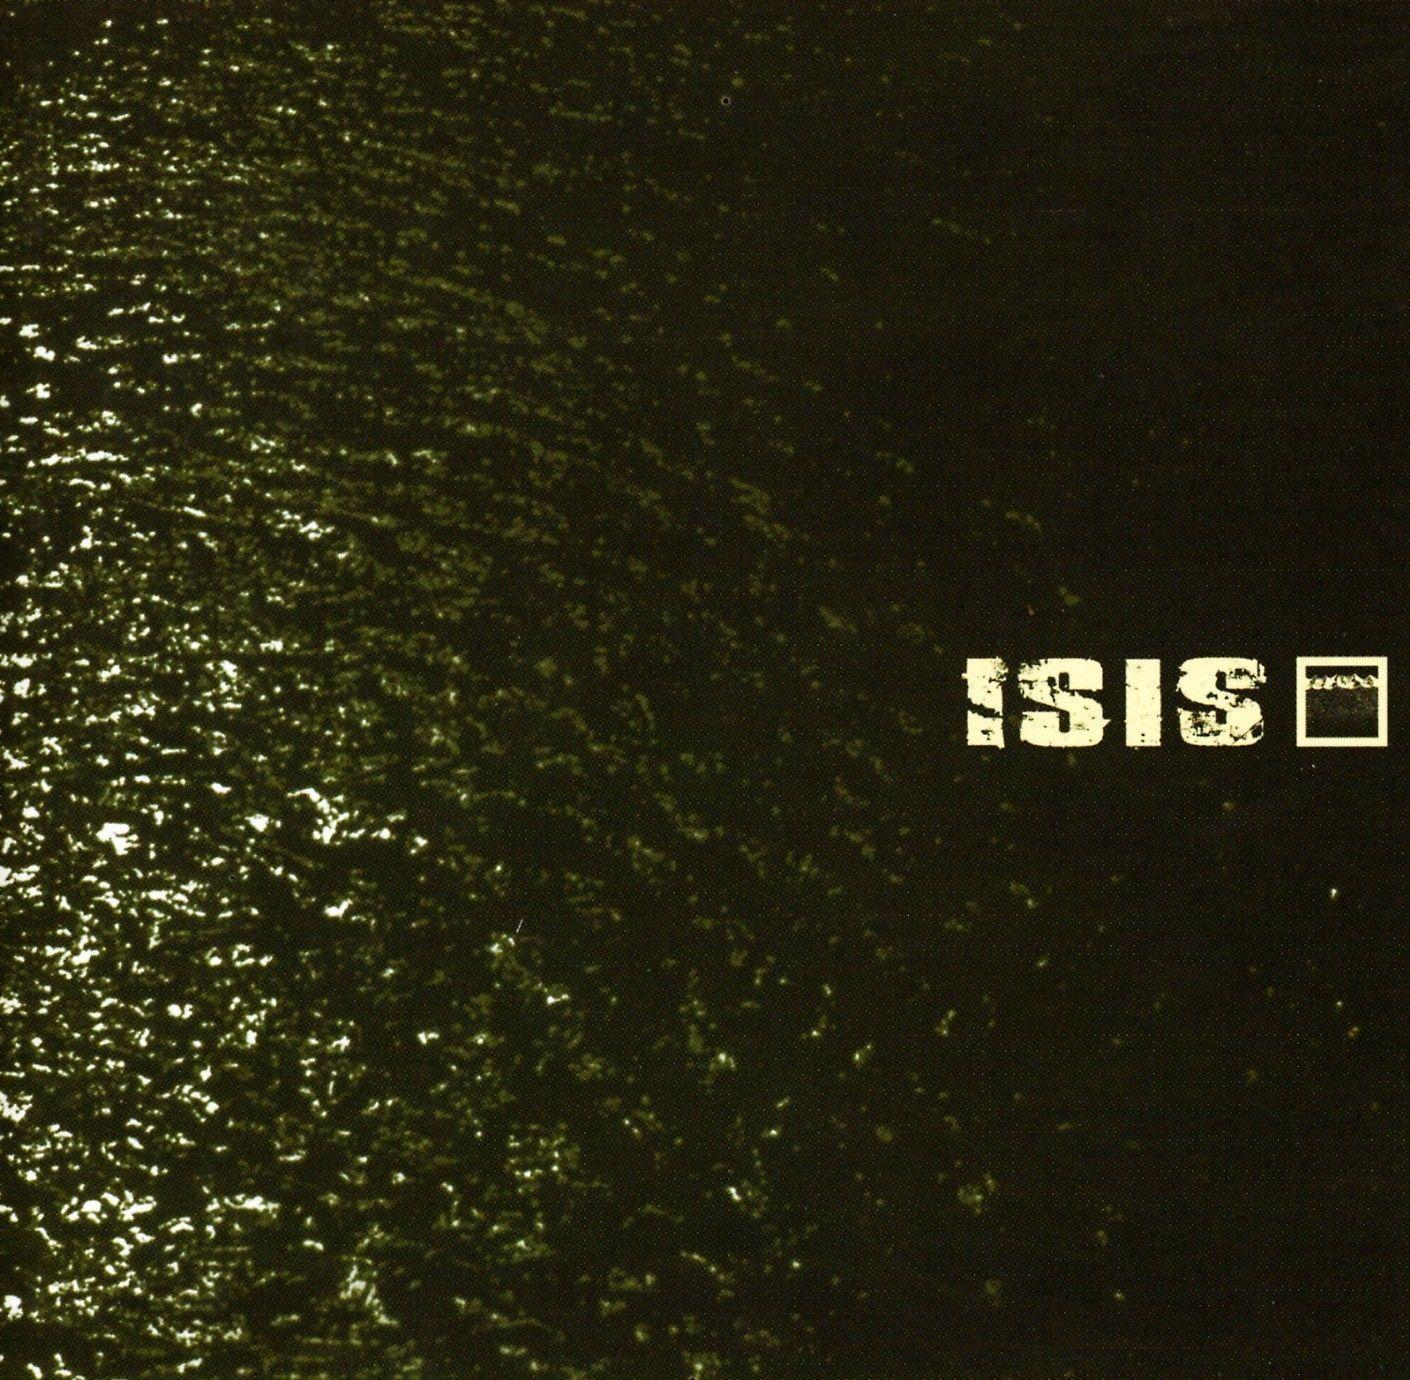 Isis - Oceanic Full Album (High Quality) - YouTube